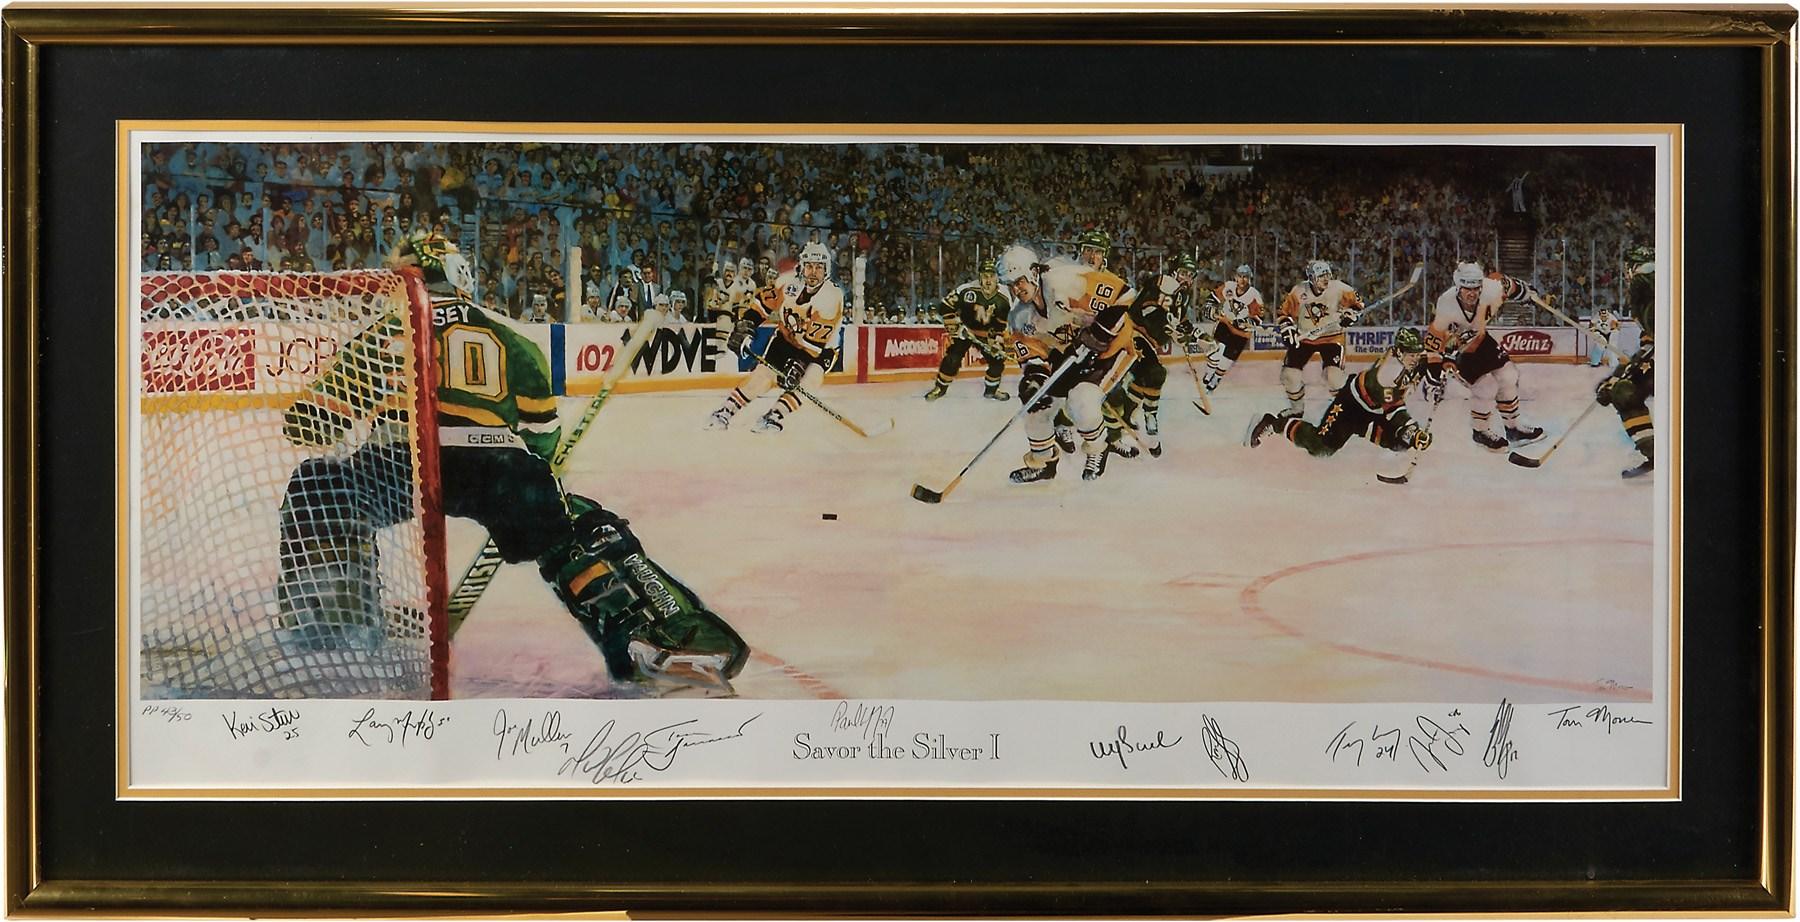 Hockey - Leland's Classic